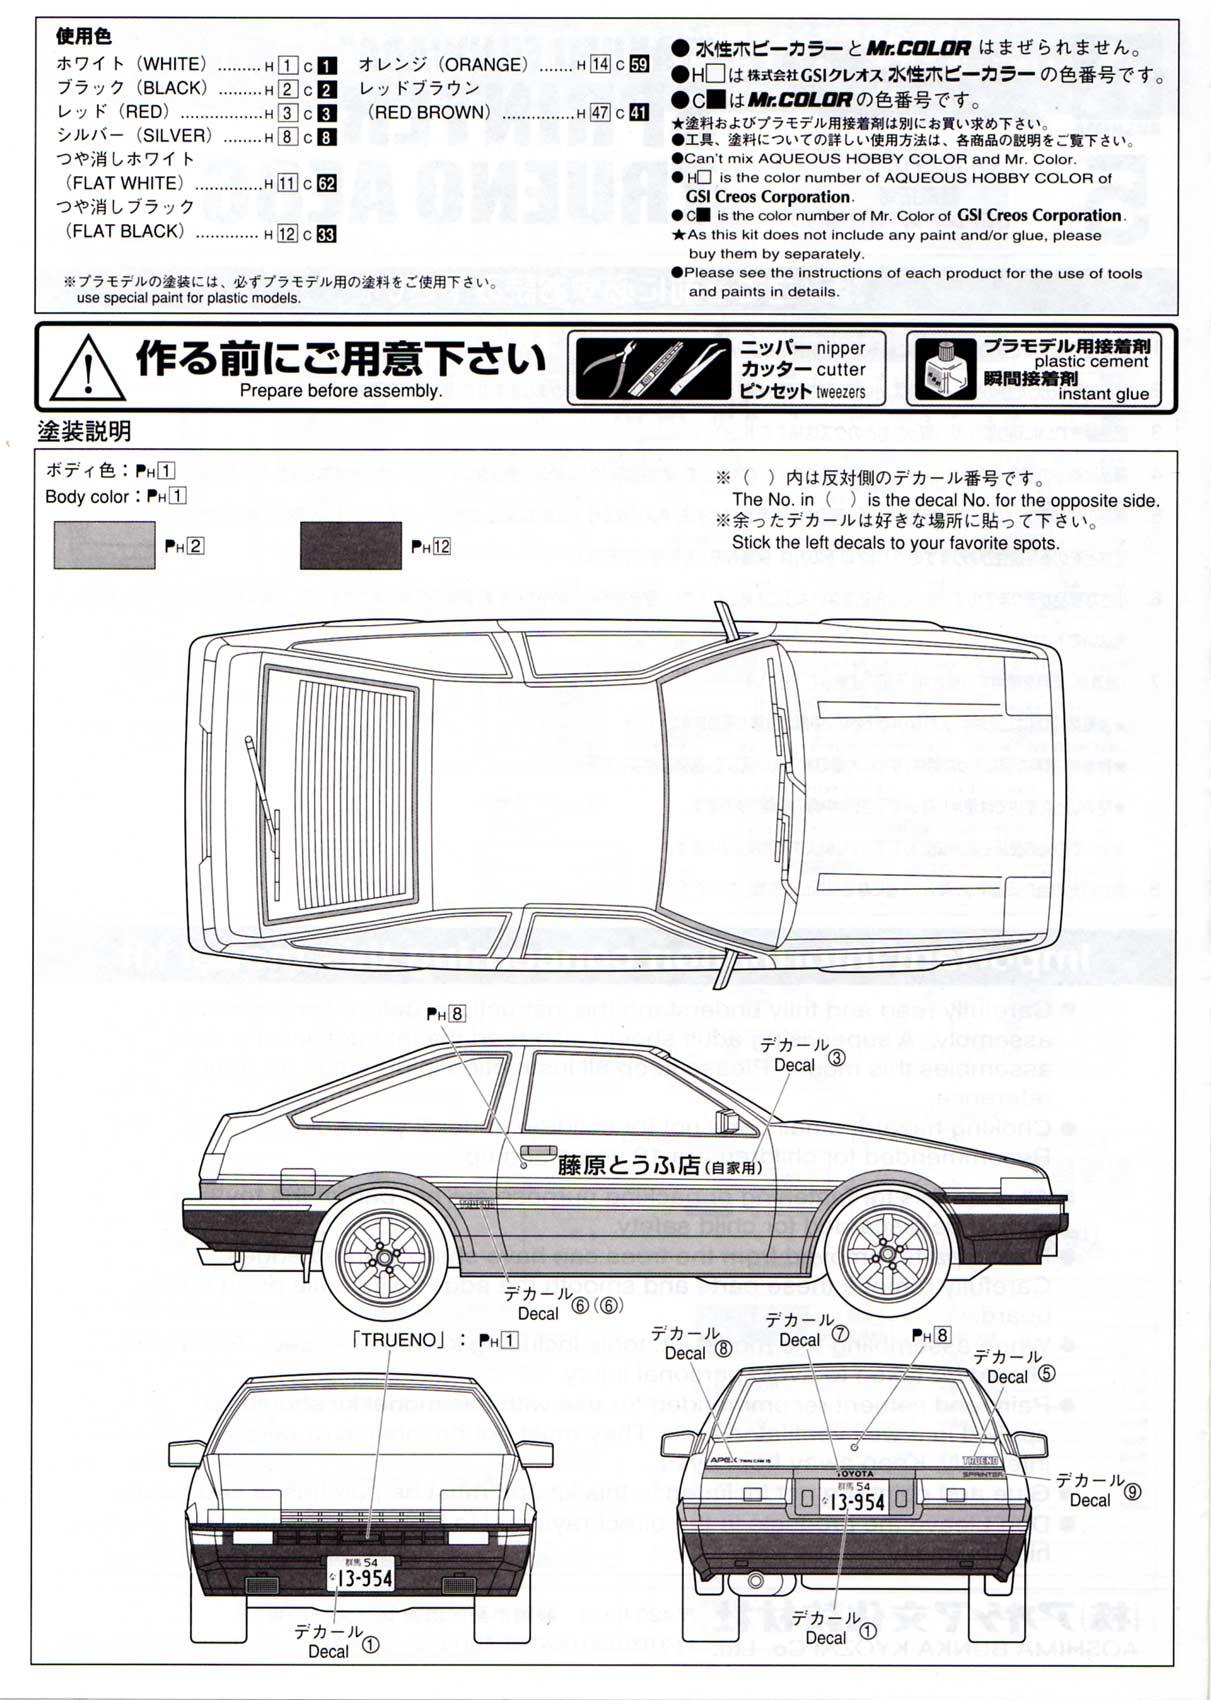 Plan de montage de la Toyota Trueno AE 86 d'Initial D - ech 1/24 (Aoshima) - Page 3